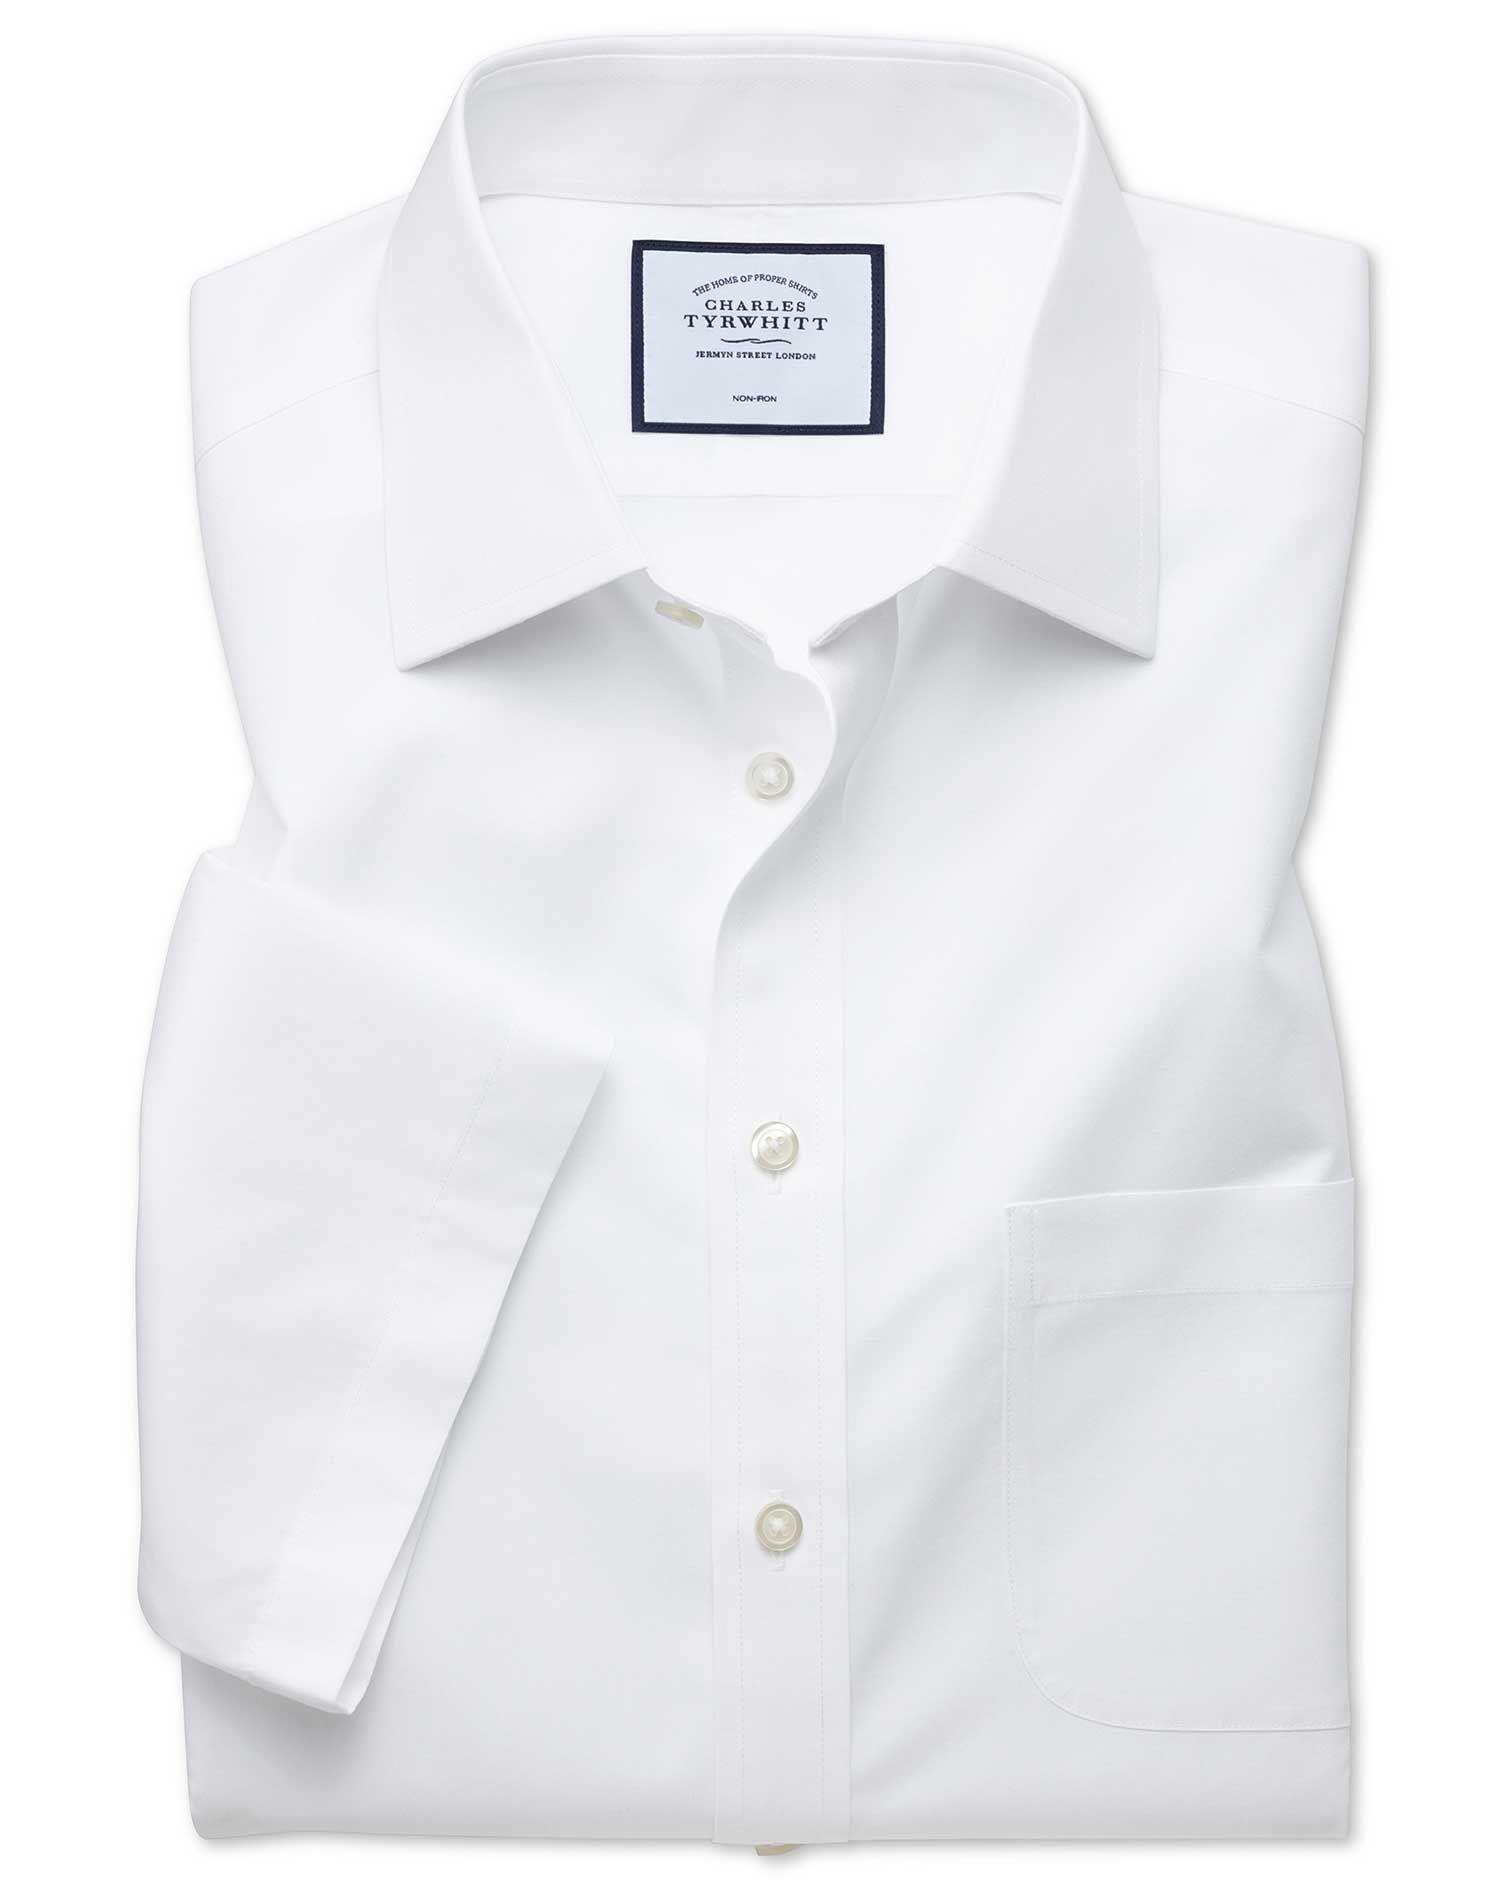 Slim Fit Non-Iron White Tyrwhitt Cool Short Sleeve Cotton Dress Shirt Size 17.5/Short by Charles Tyrwhitt #shortsleevedressshirts